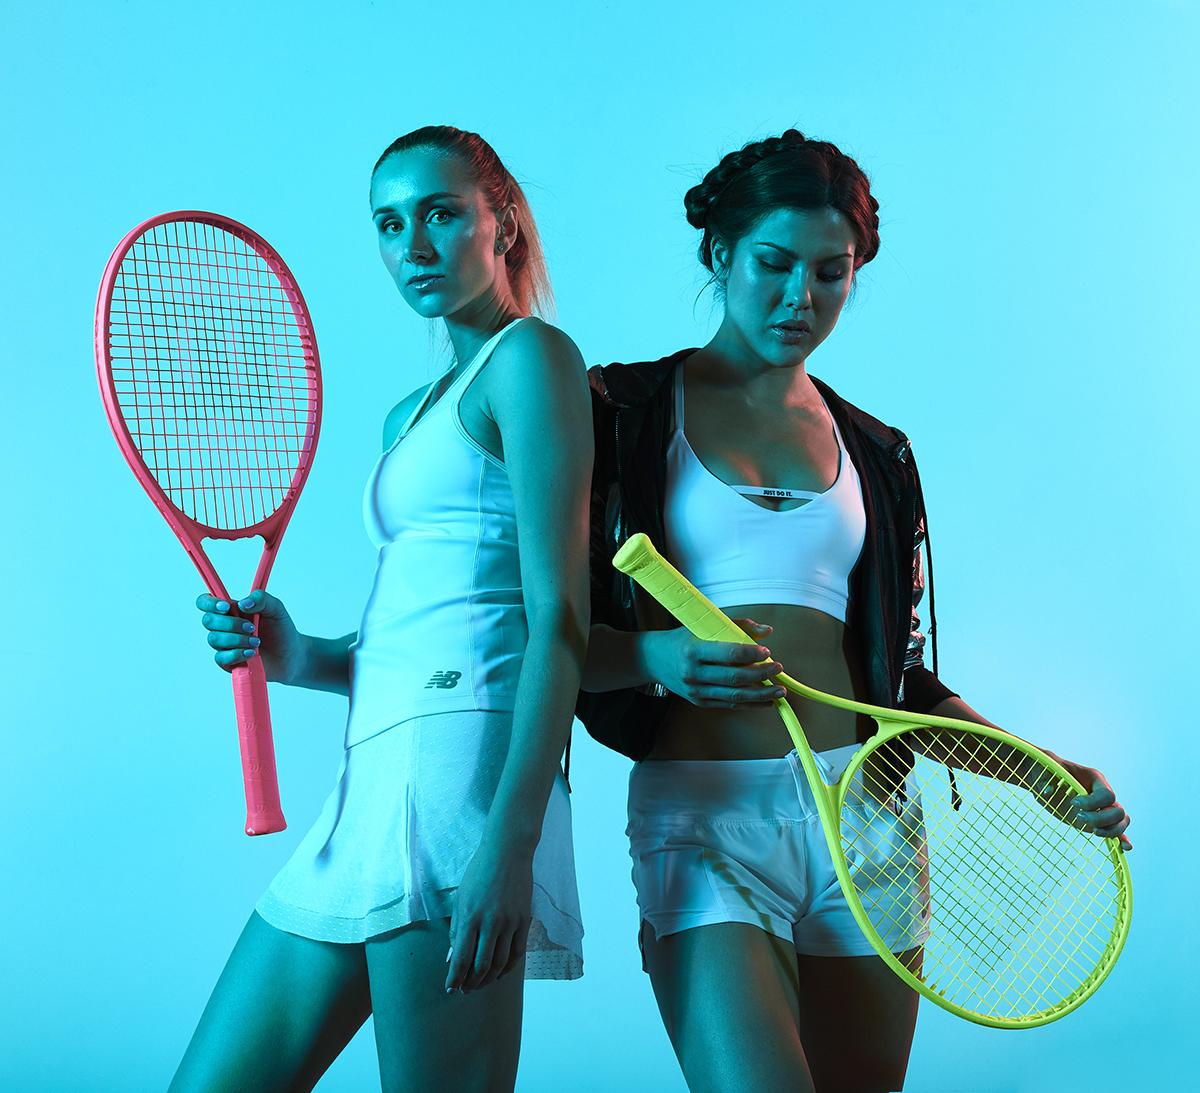 20181111_Tennis12610_FINAL_WEB.jpg